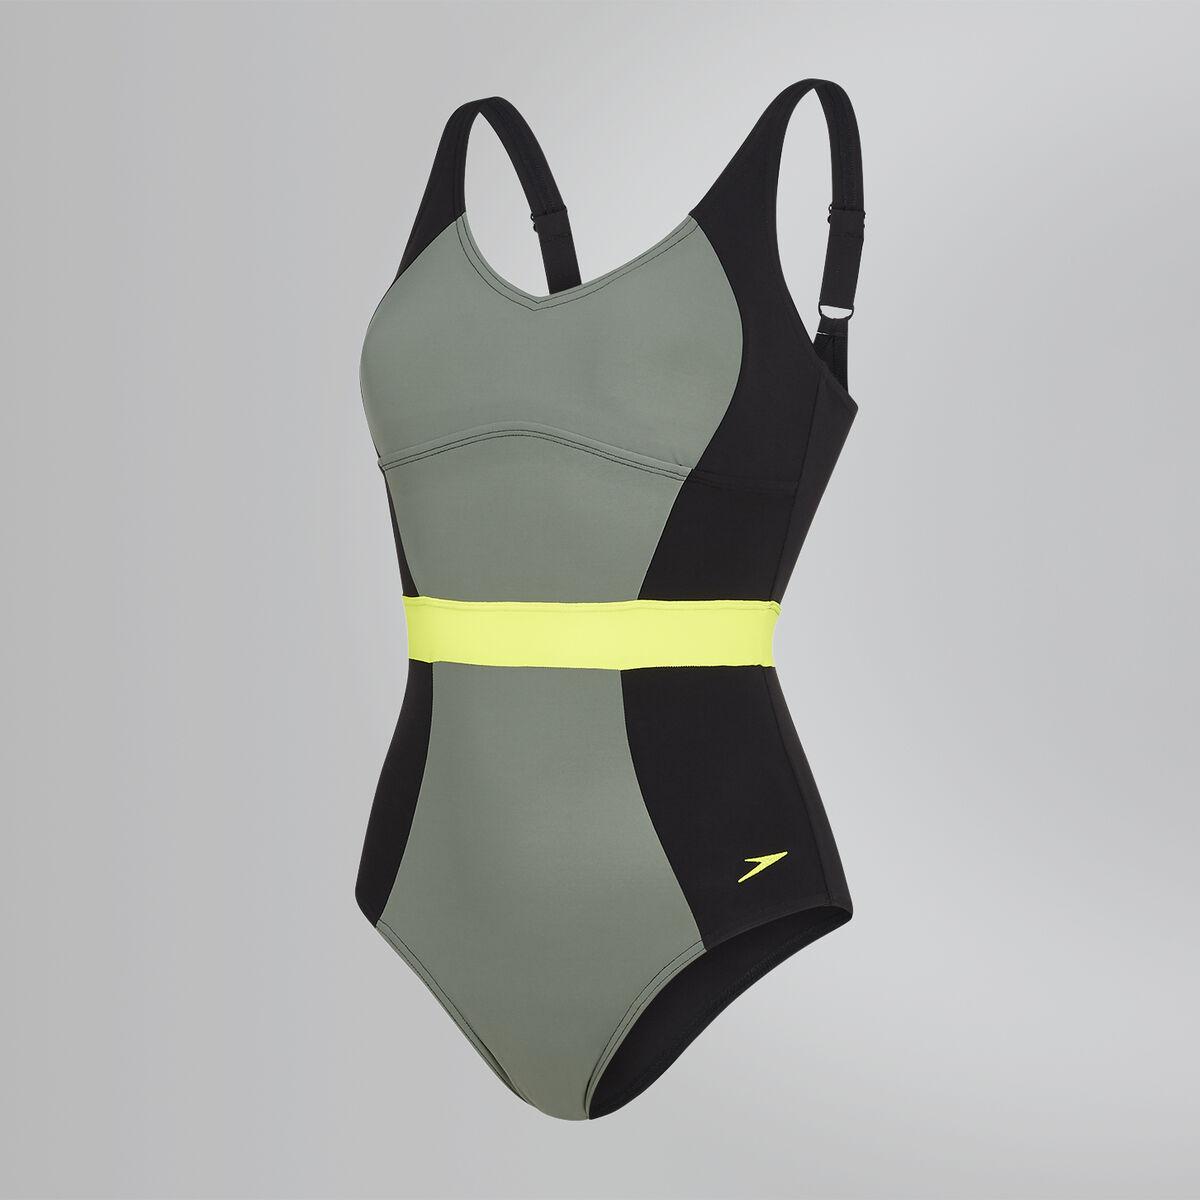 Sculpture CrystalGleam Swimsuit